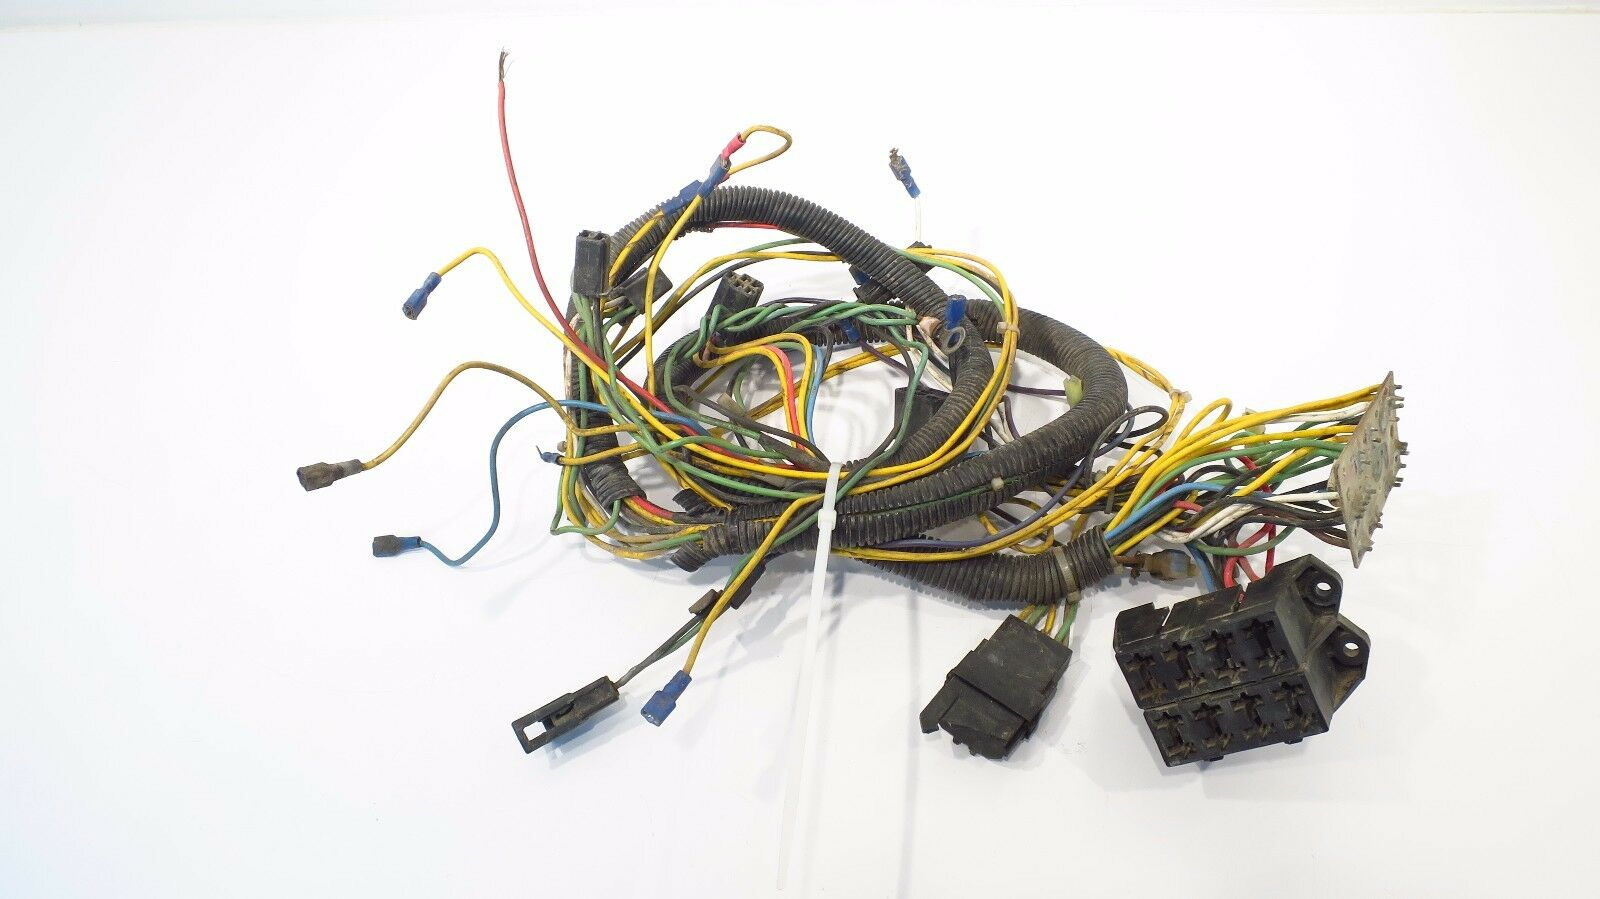 OEM Grasshopper ELECTRIC WIRING HARNESS 604965 fits 1996-2005 Model 718  Mowers